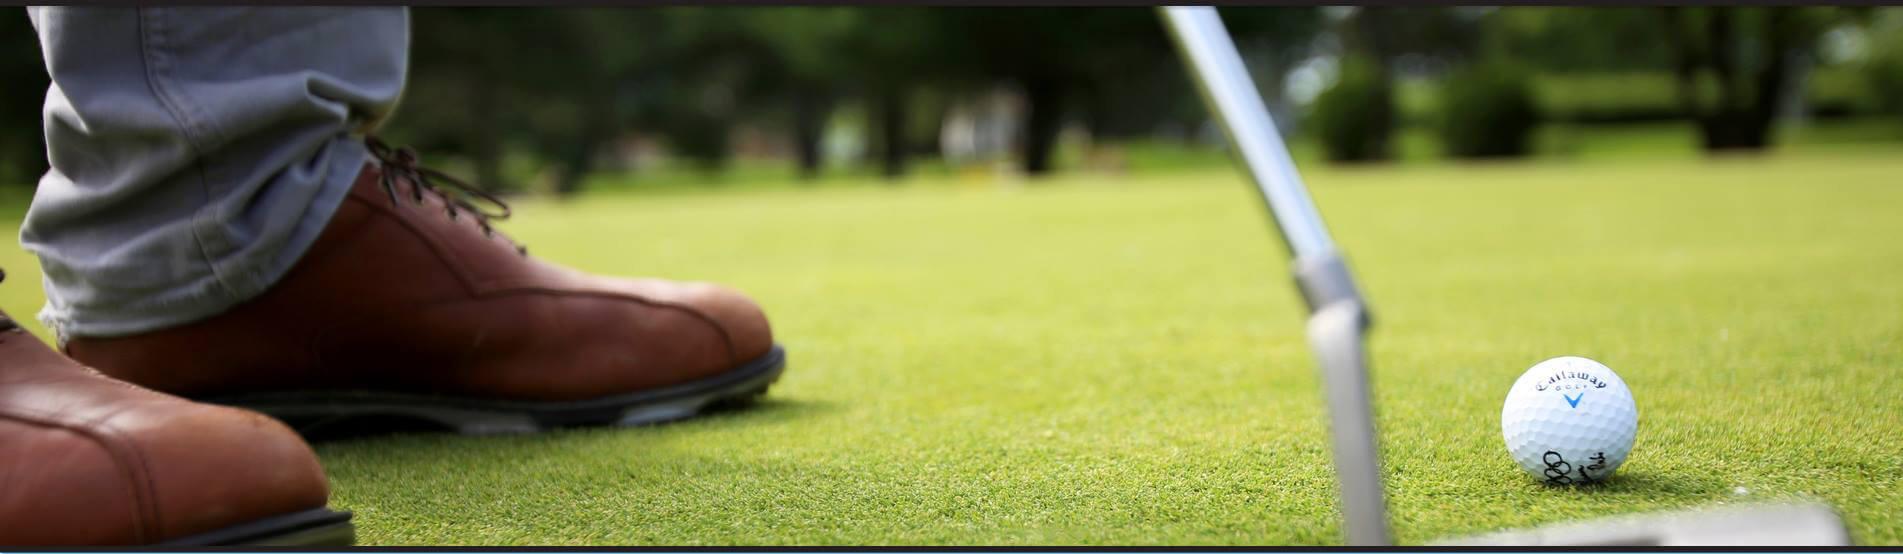 golf-heriot-slider-03